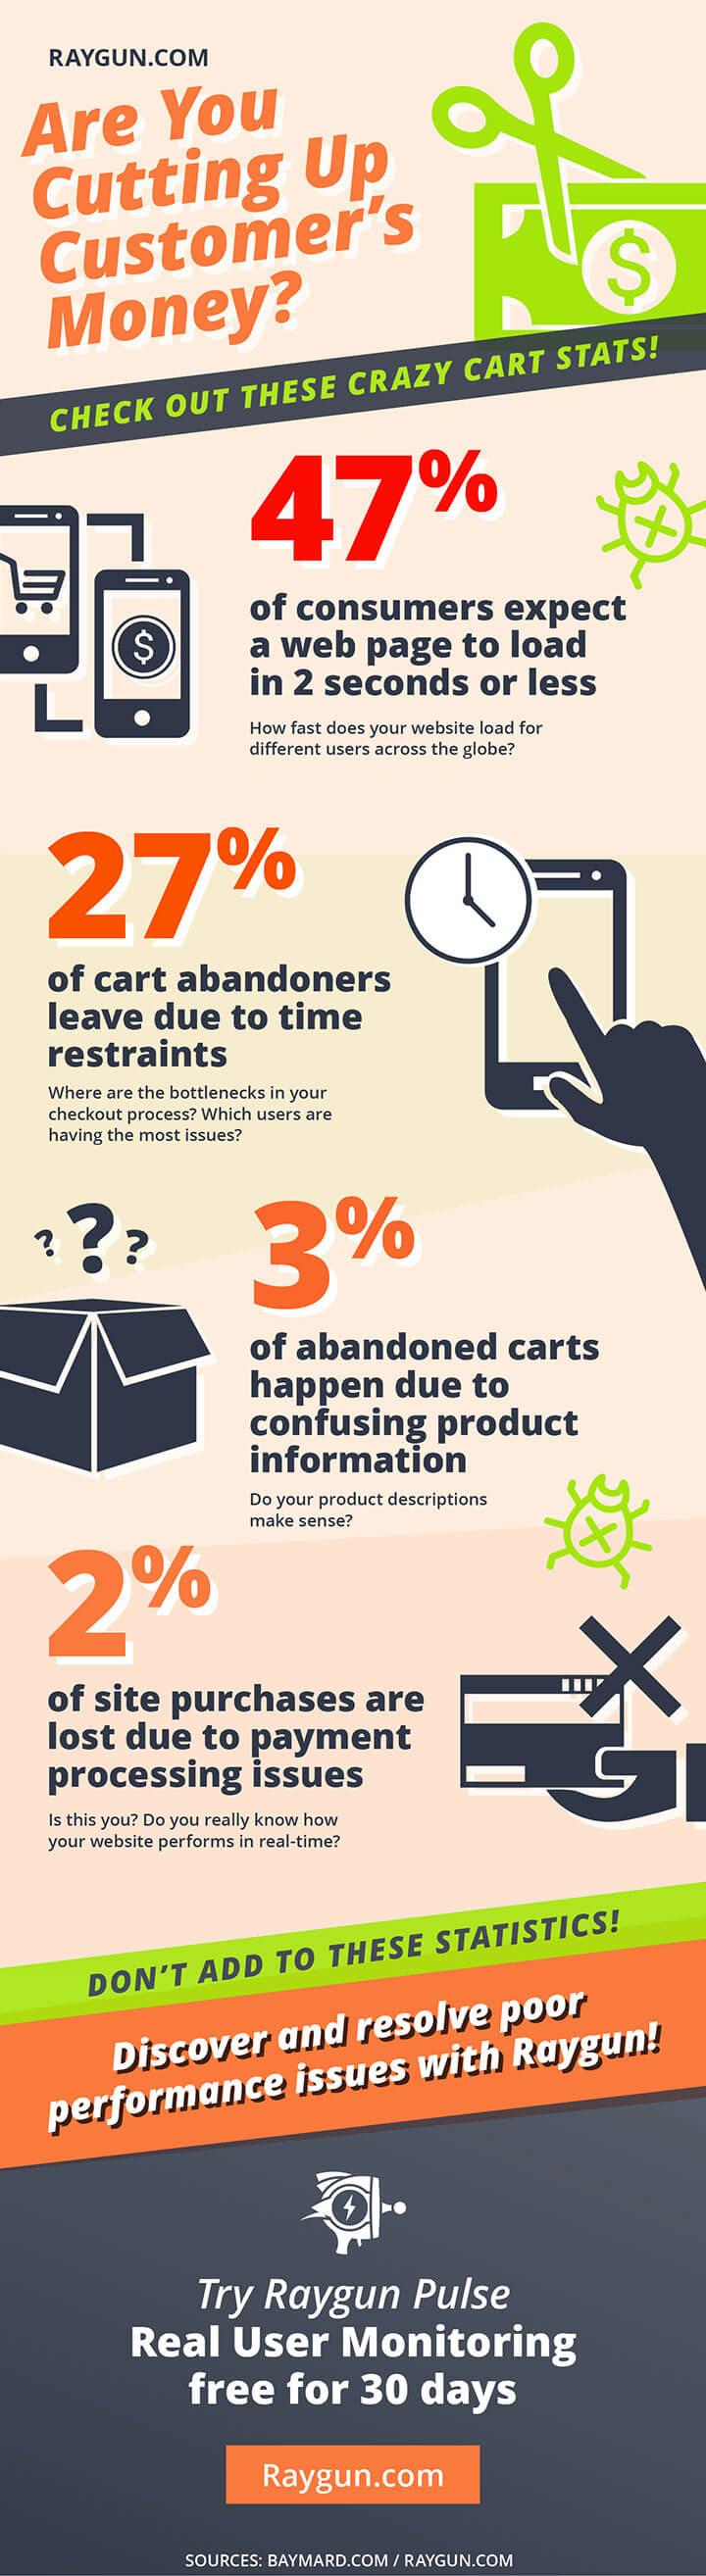 raygun_ecommerce_infographic